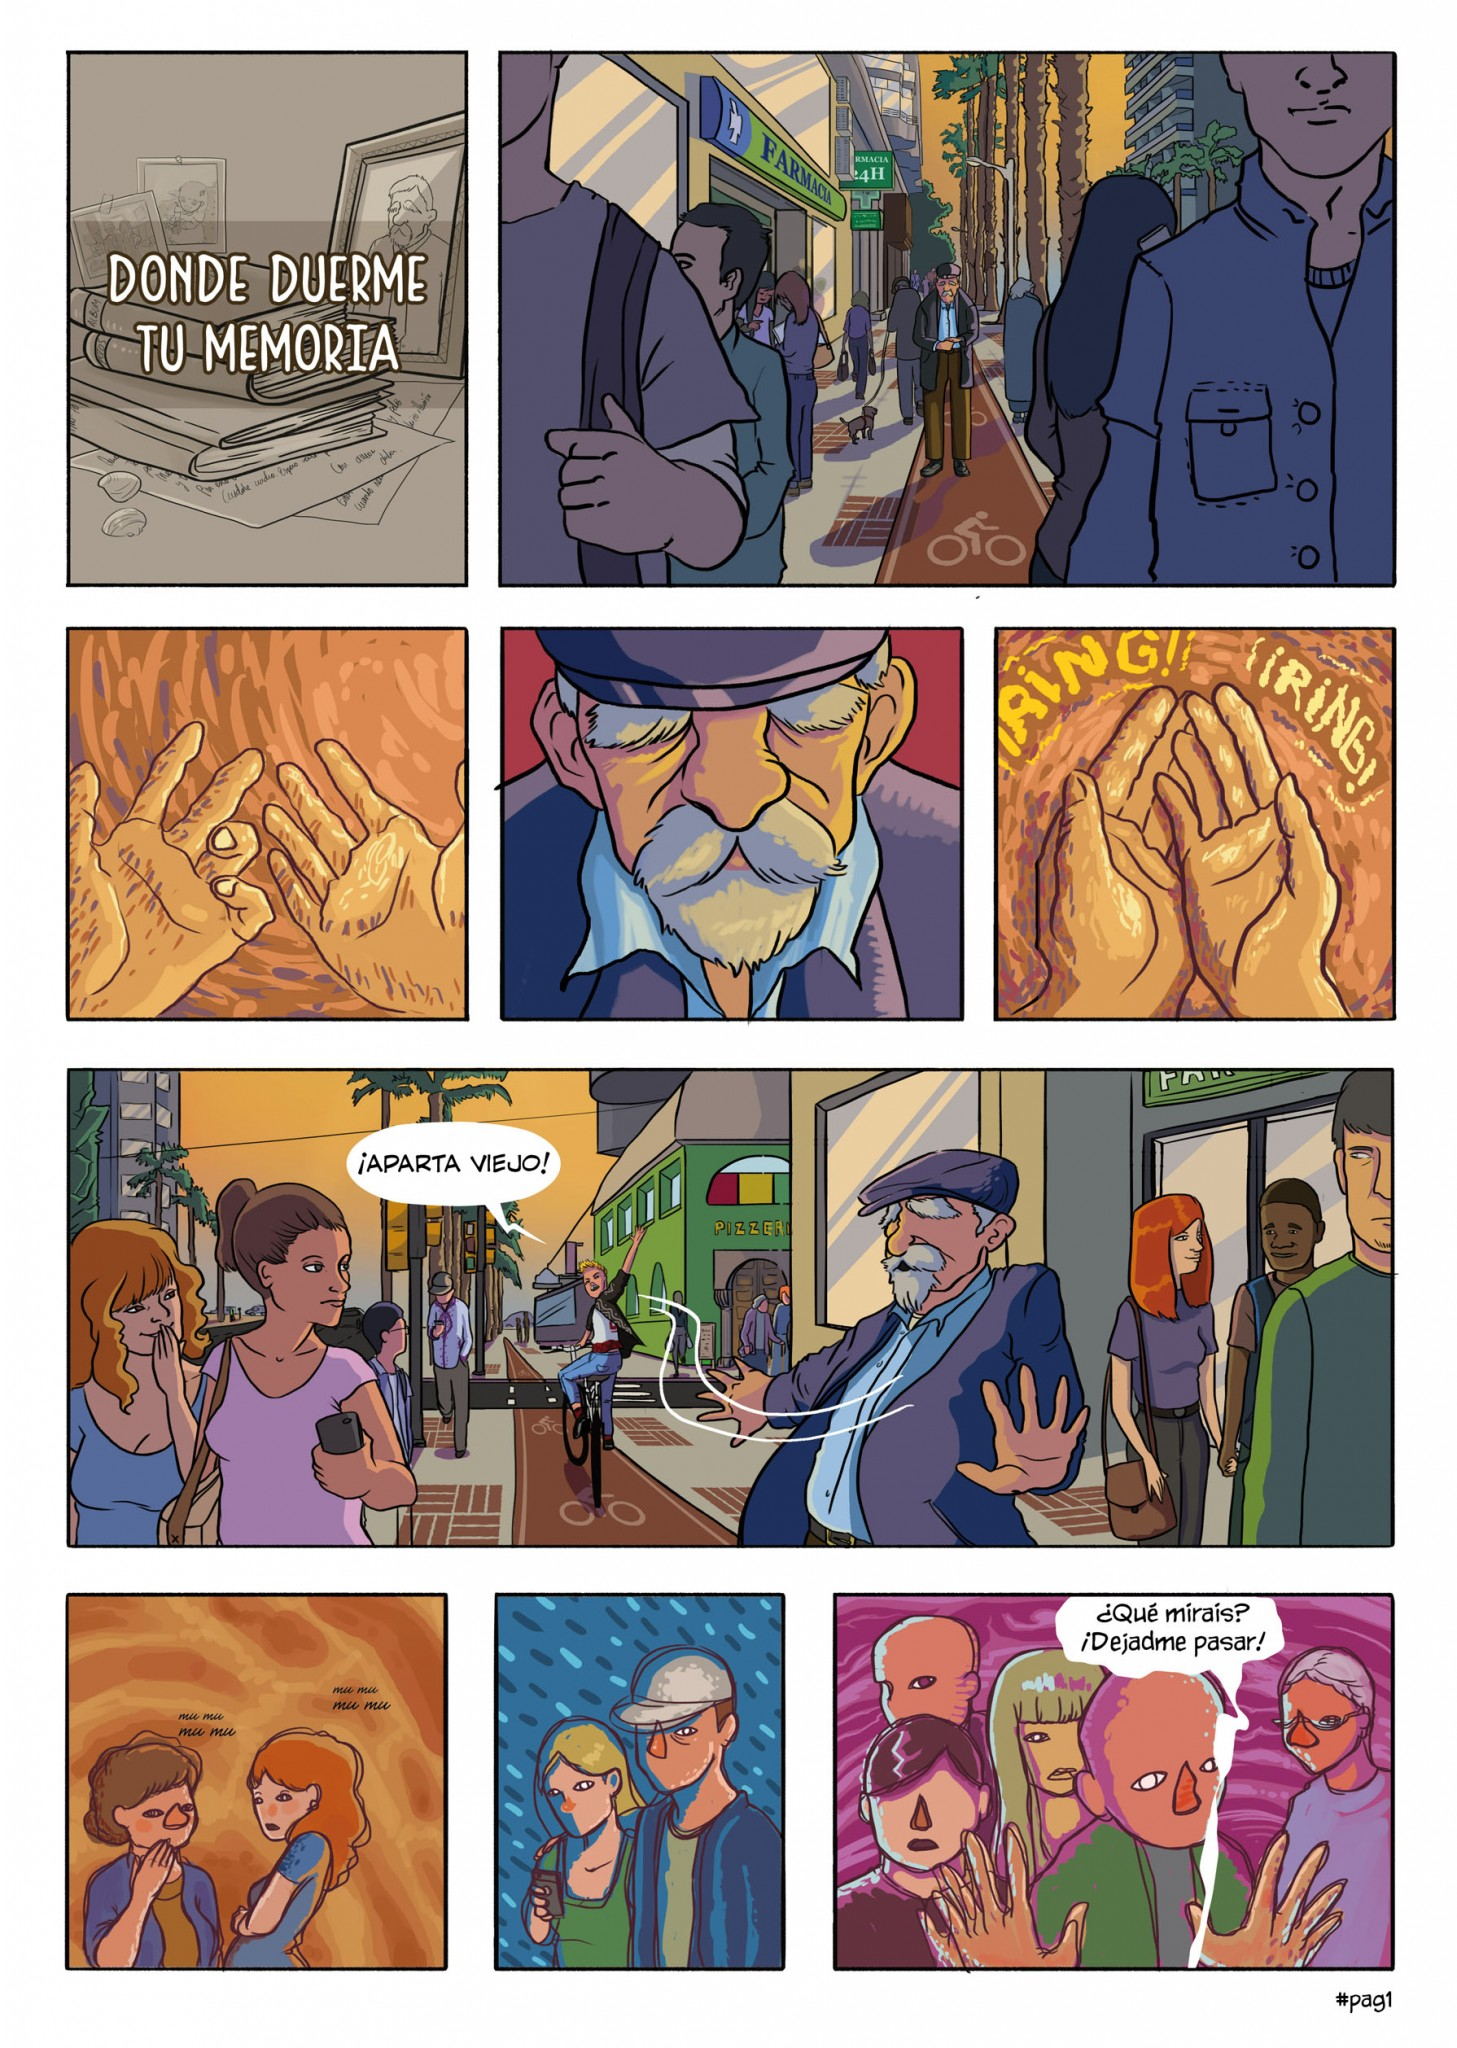 Pagina comic 01